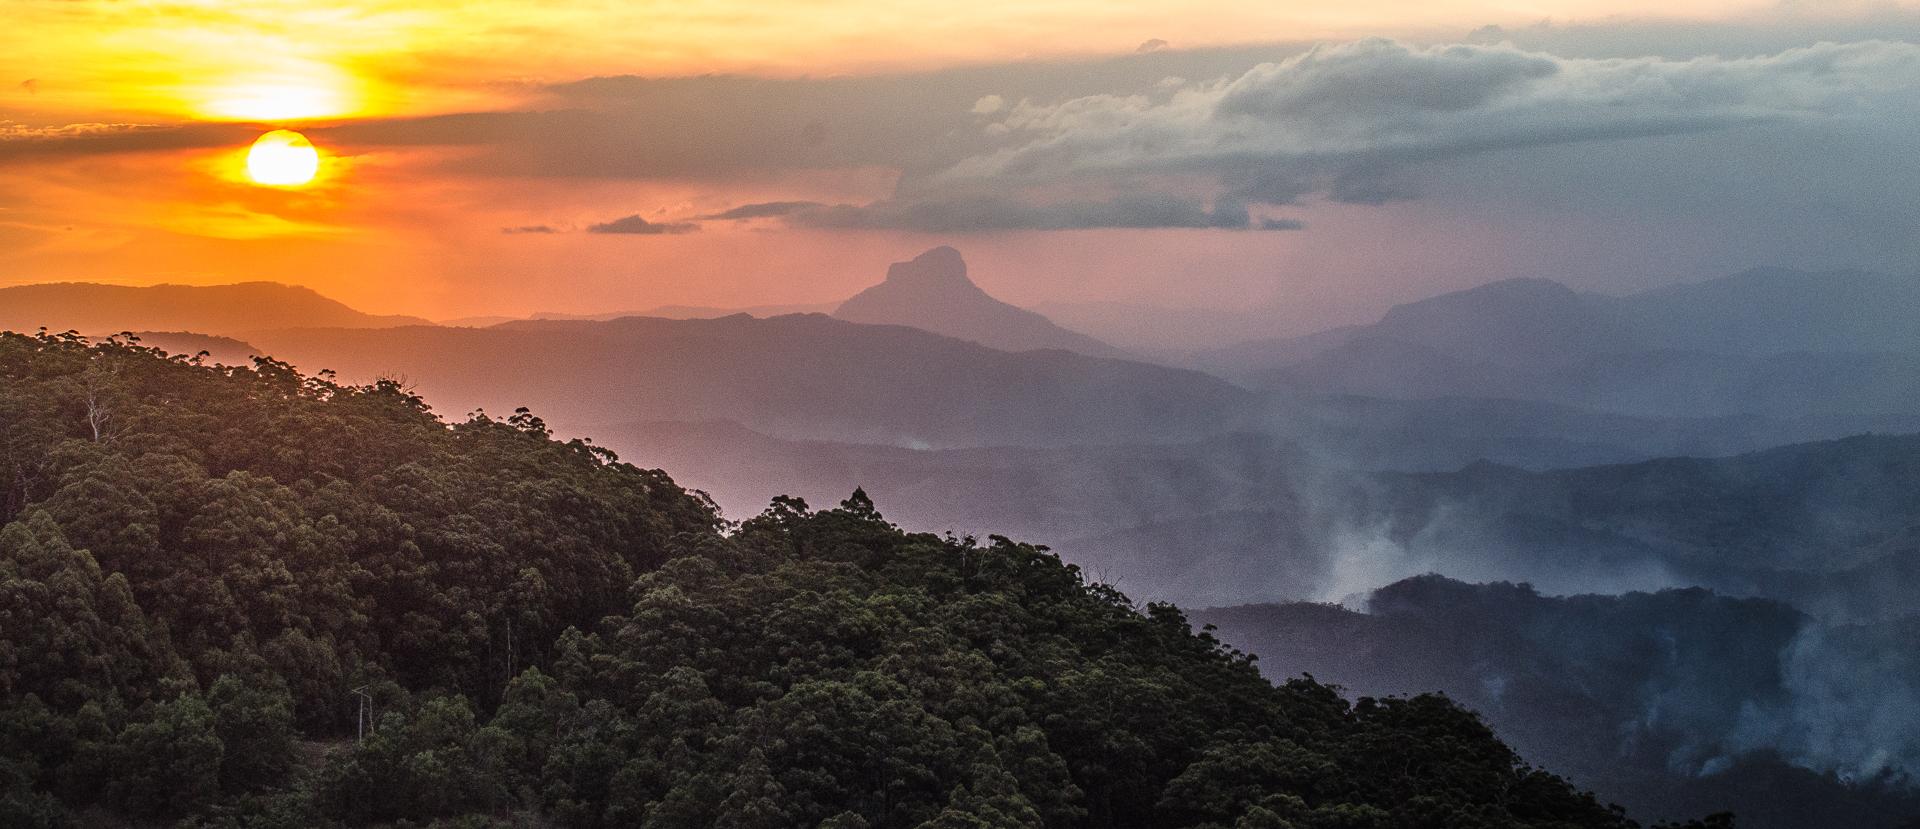 sandy_lollback_1_mountains at sunset.jpg